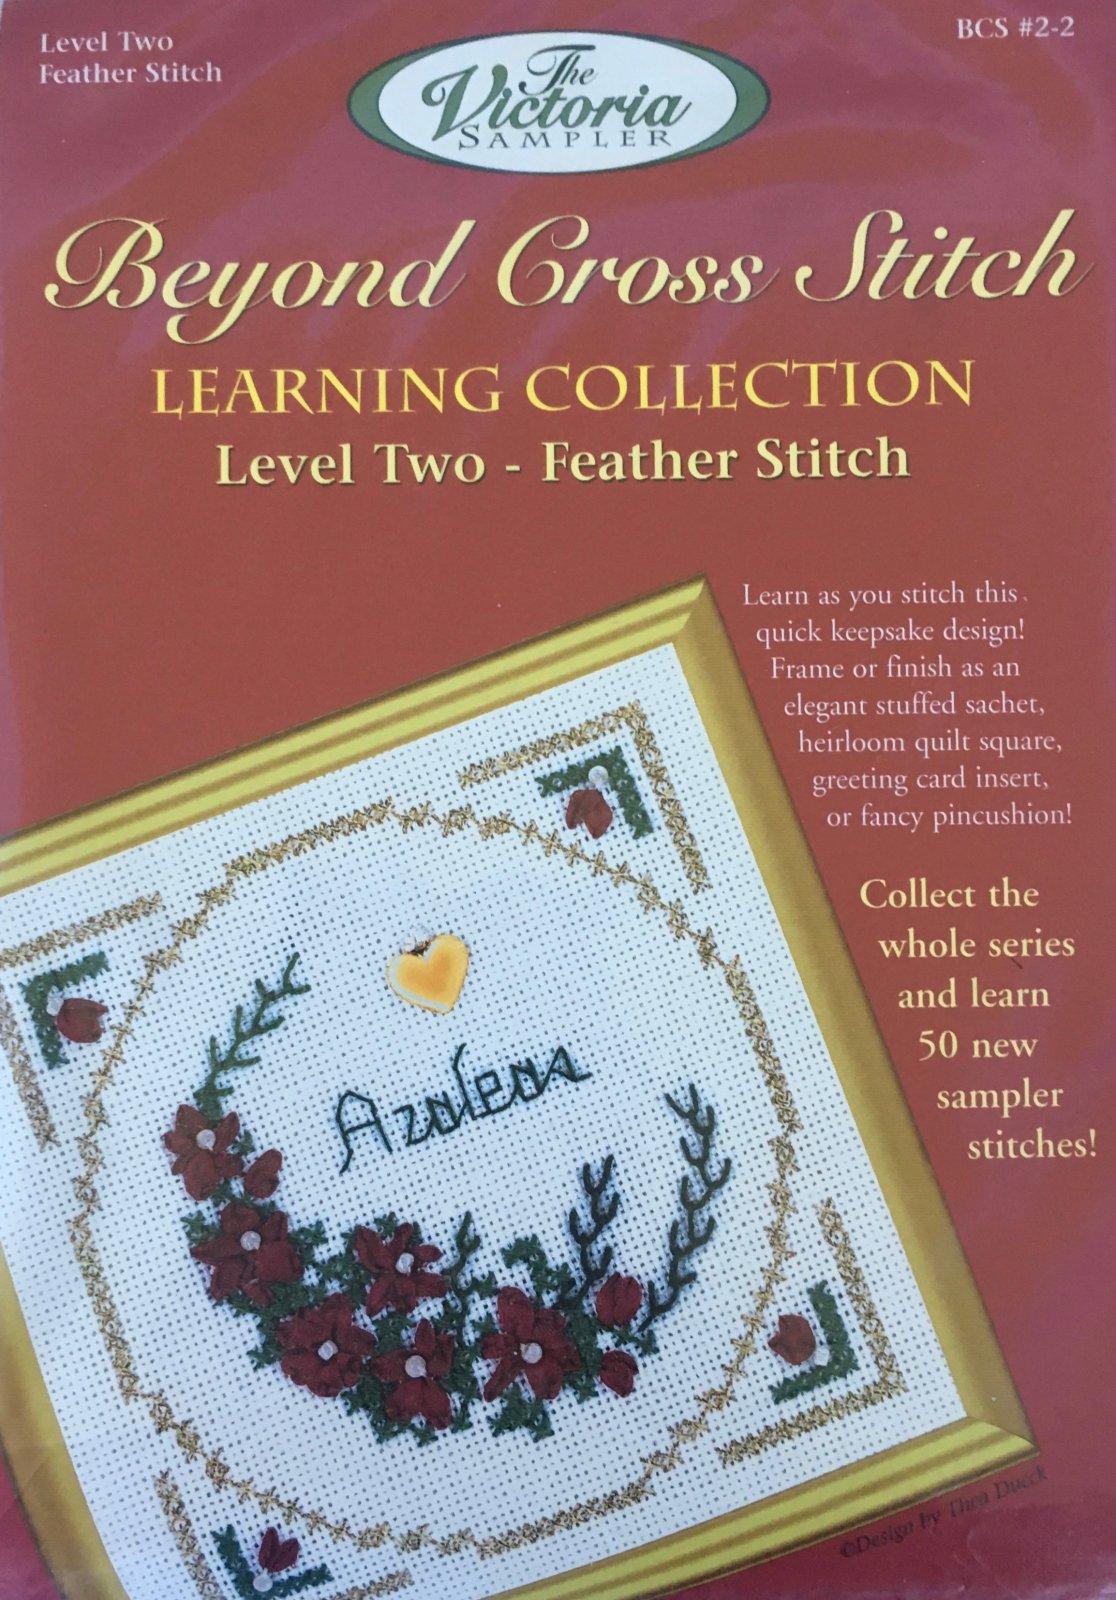 The Victoria Sampler: Azaleas Level 2 - #2 Kit; Feather Stitch